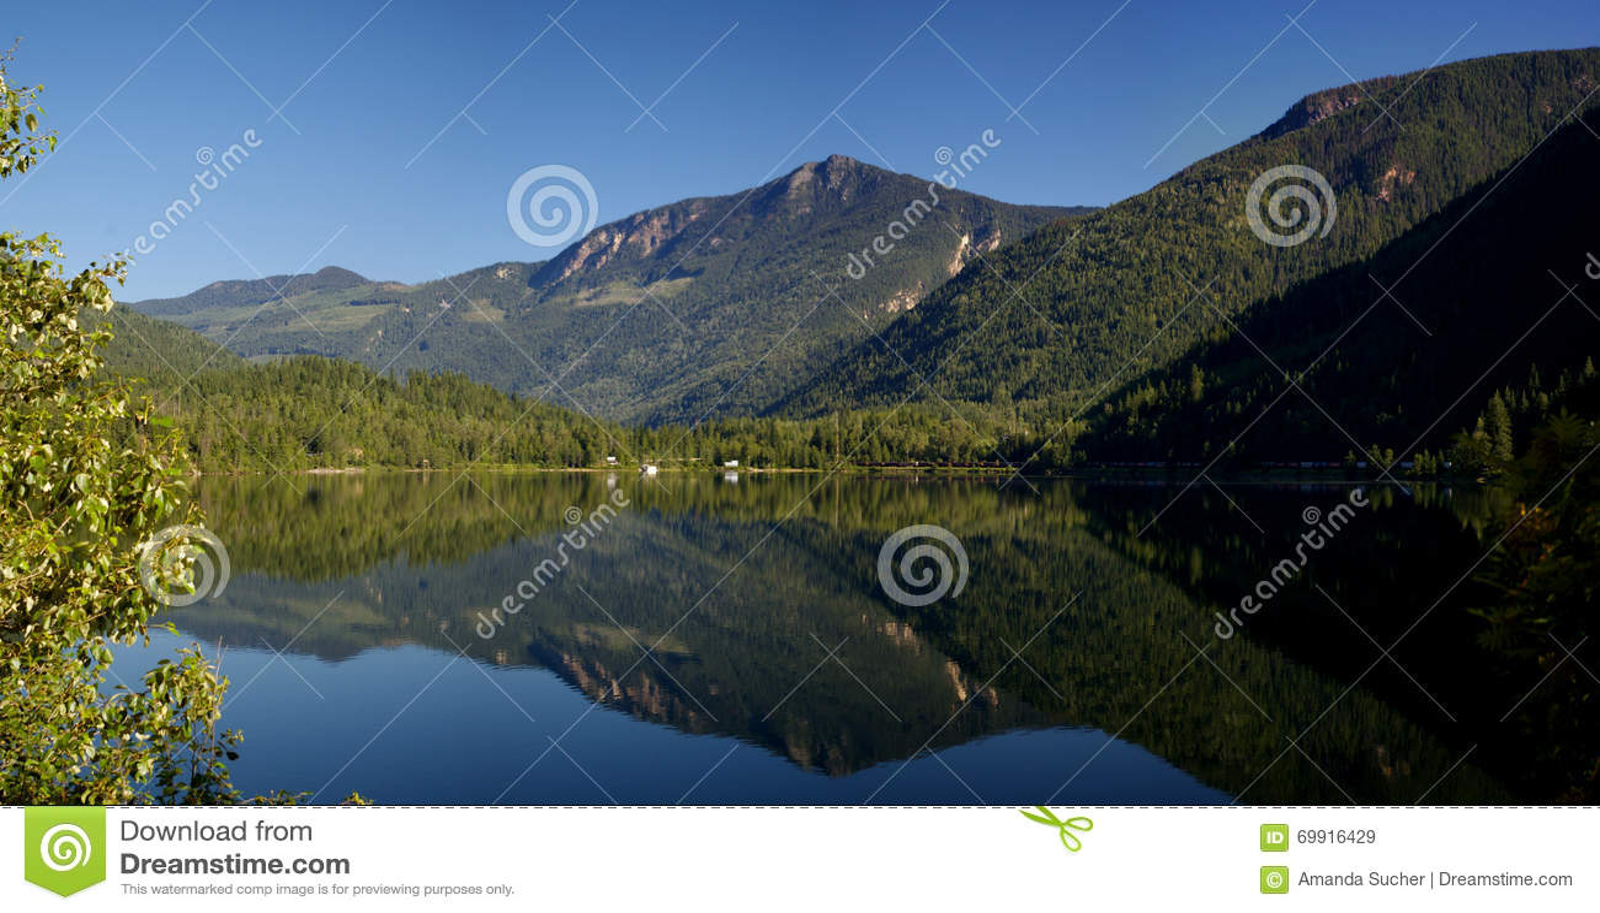 Random Mountains